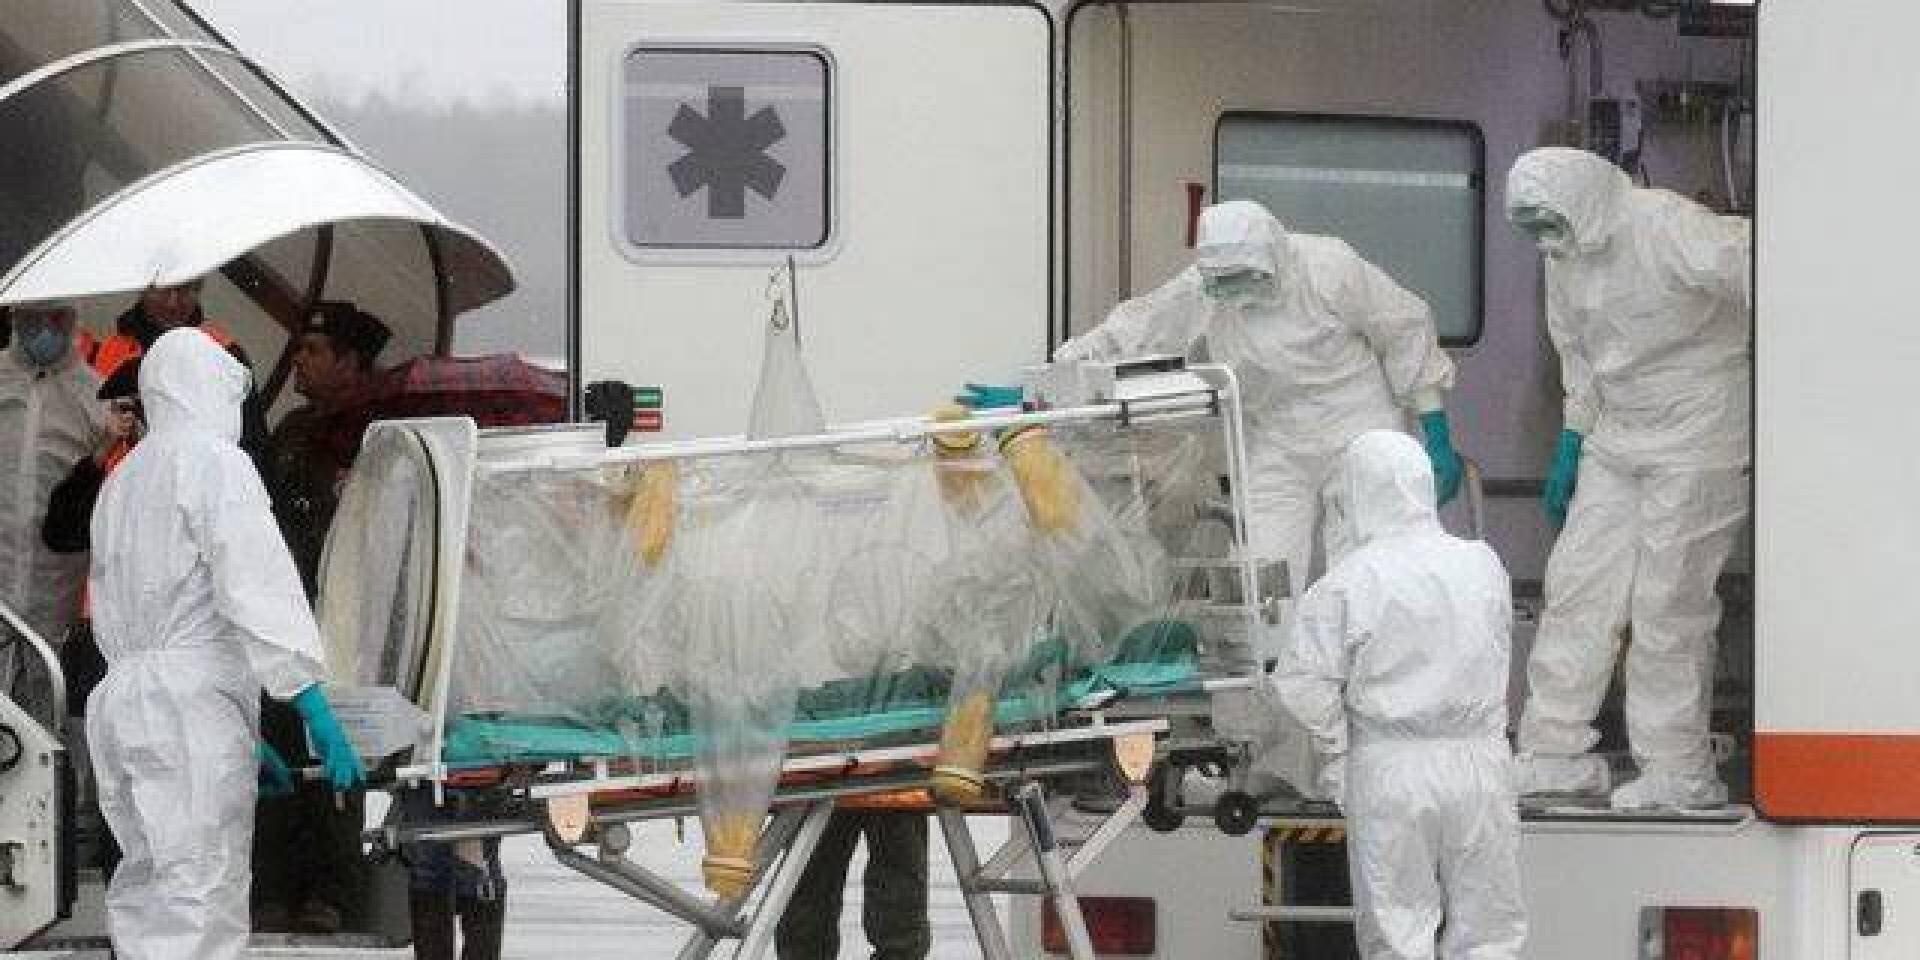 img 9311 1 - هونغ كونغ تسجل أول حالة وفاة بفيروس كورونا